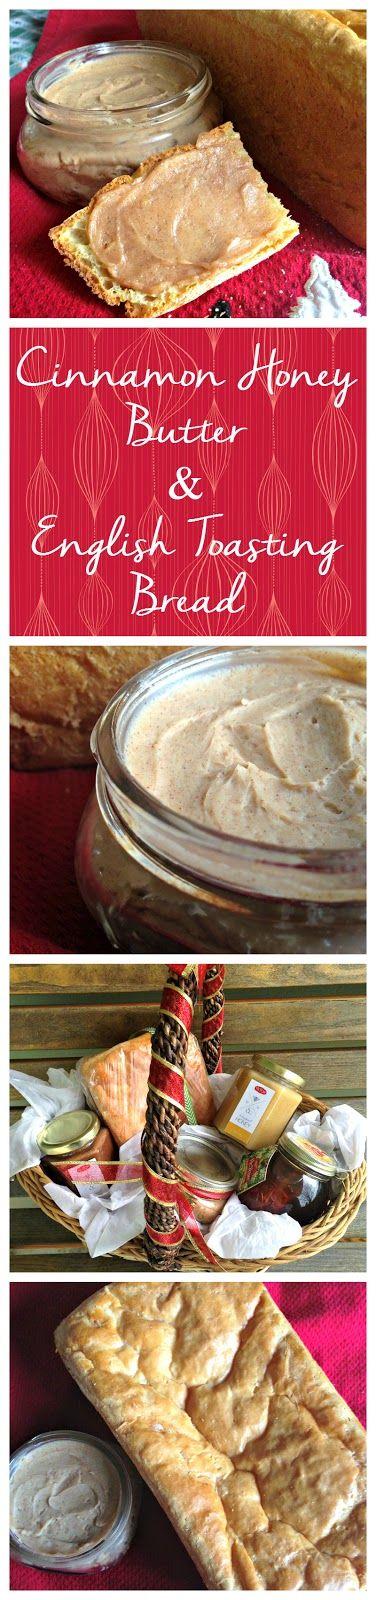 Cinnamon Honey Butter with English Toasting Bread - Plus Christmas Gift Basket Idea! #HoneyForHolidays #DonVictor #Shop